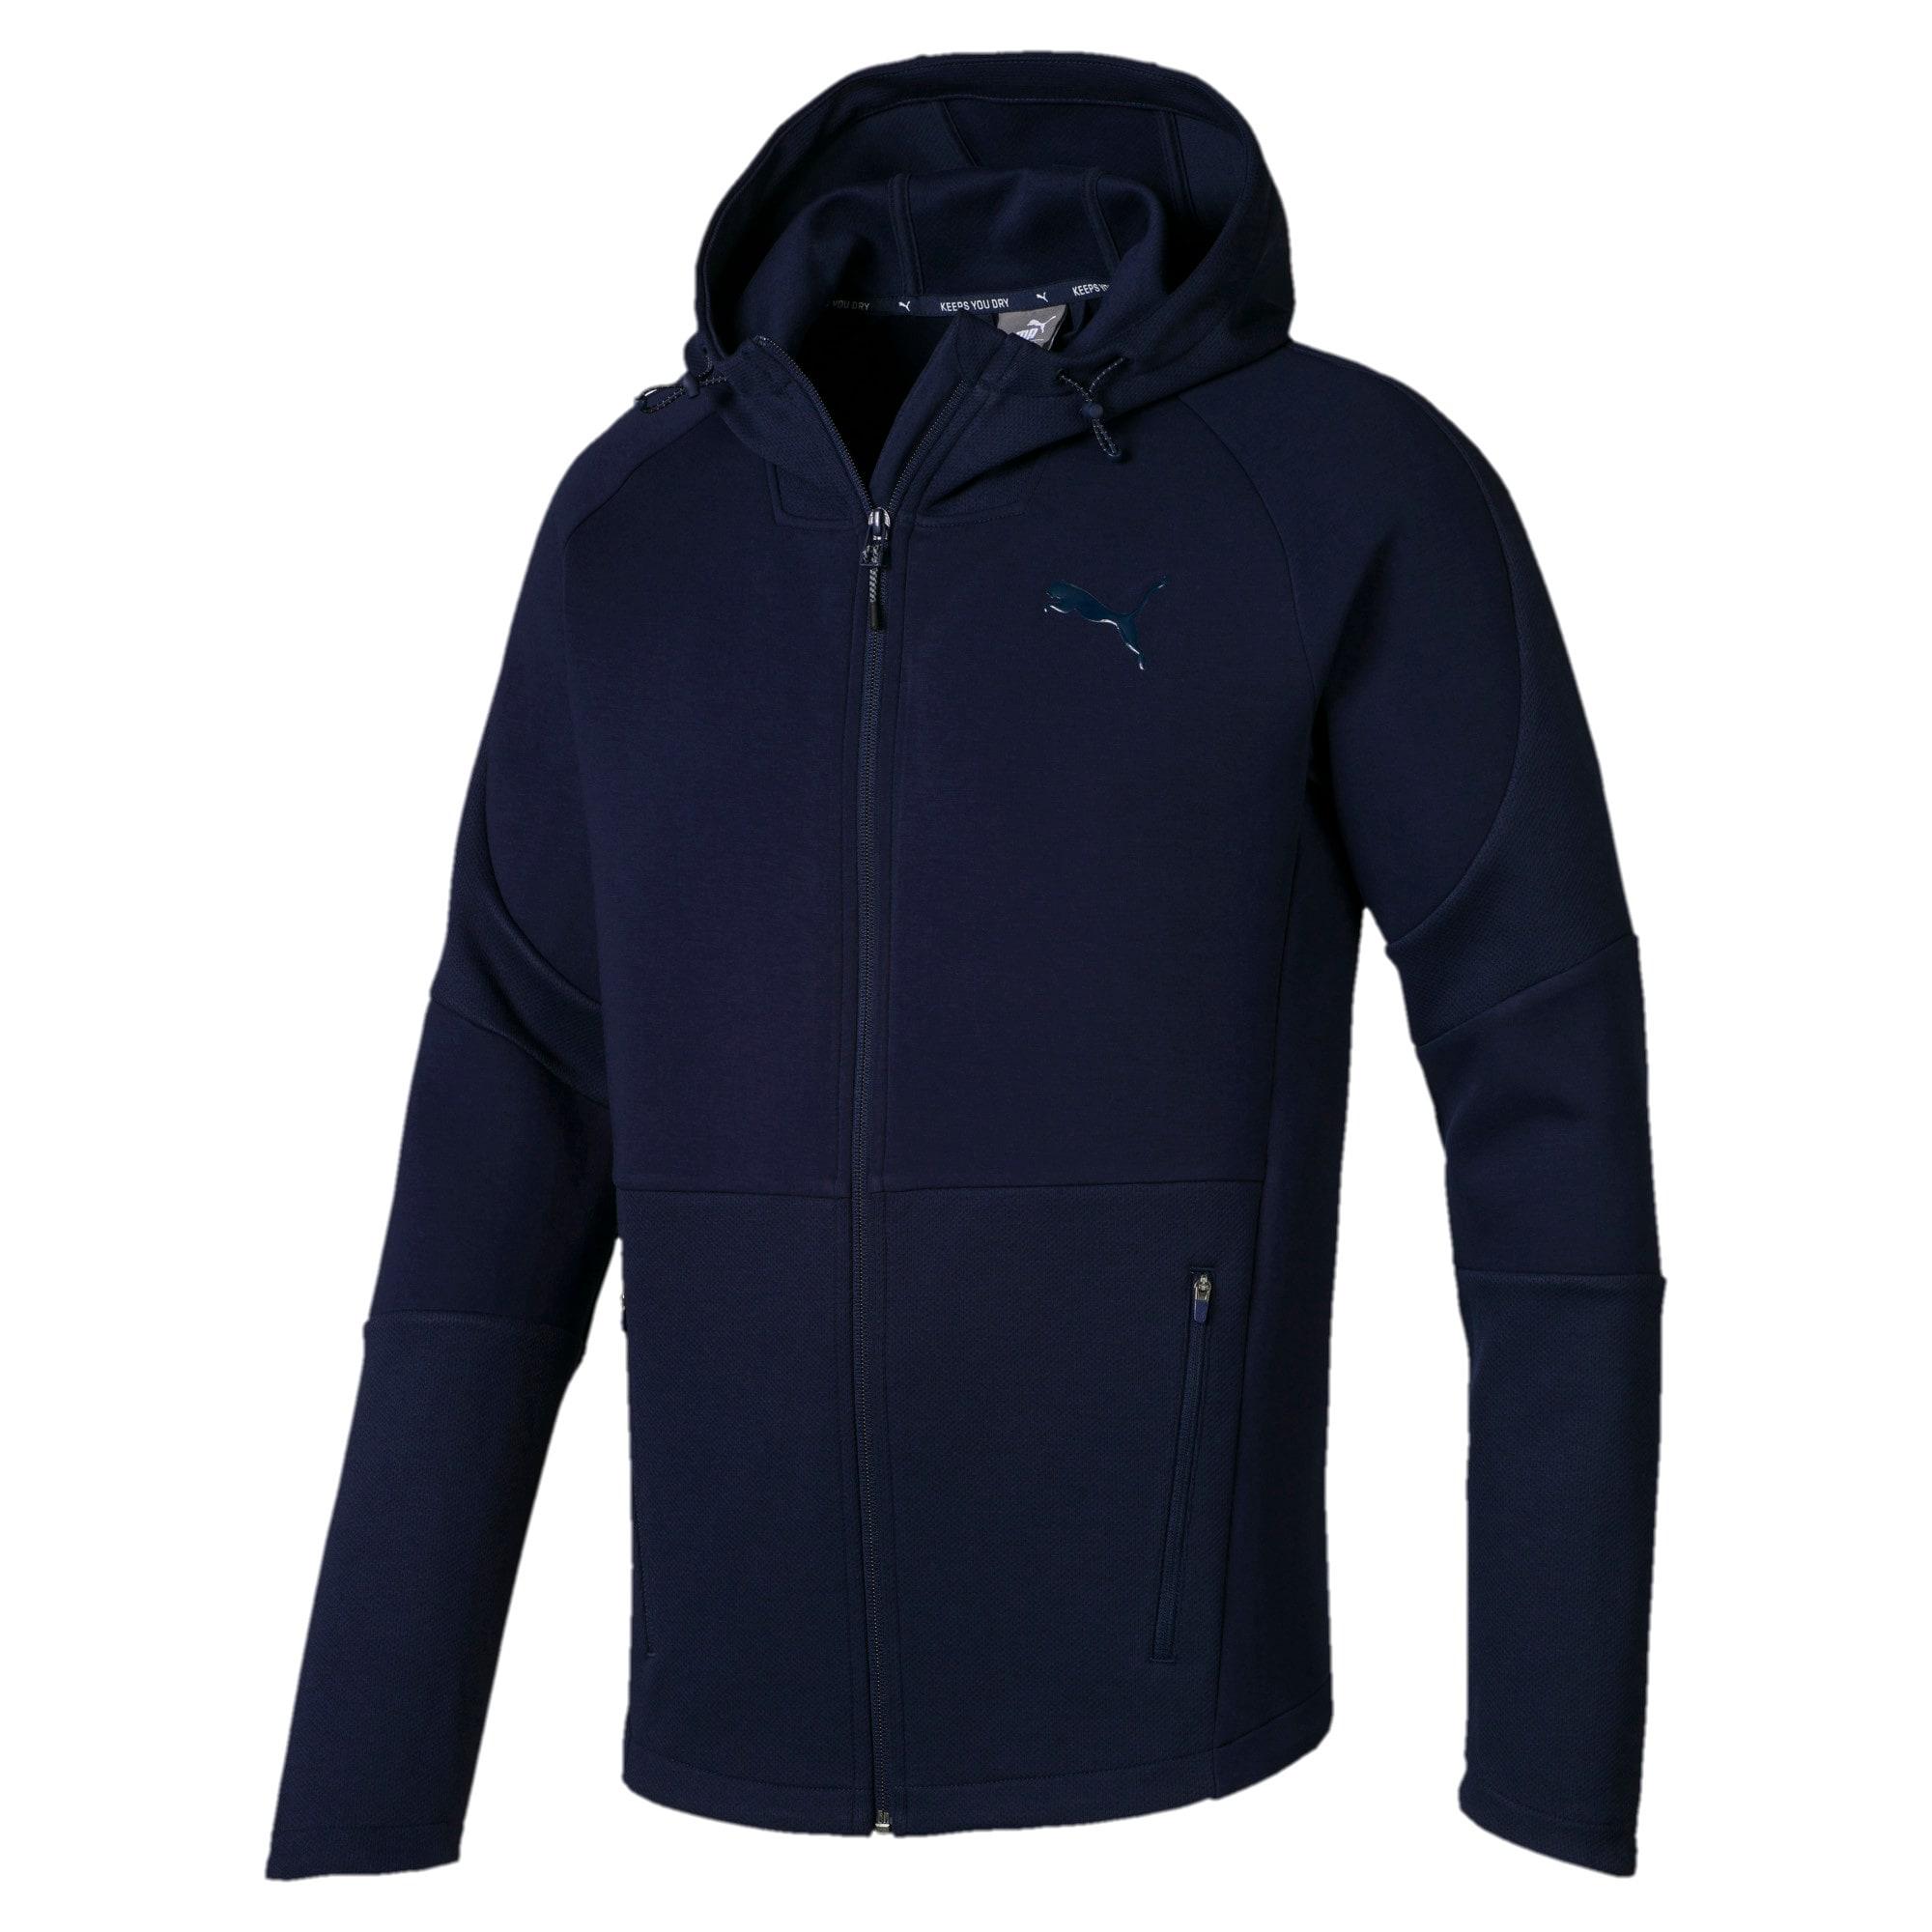 Thumbnail 2 of Evostripe Move Hooded Jacket, Peacoat, medium